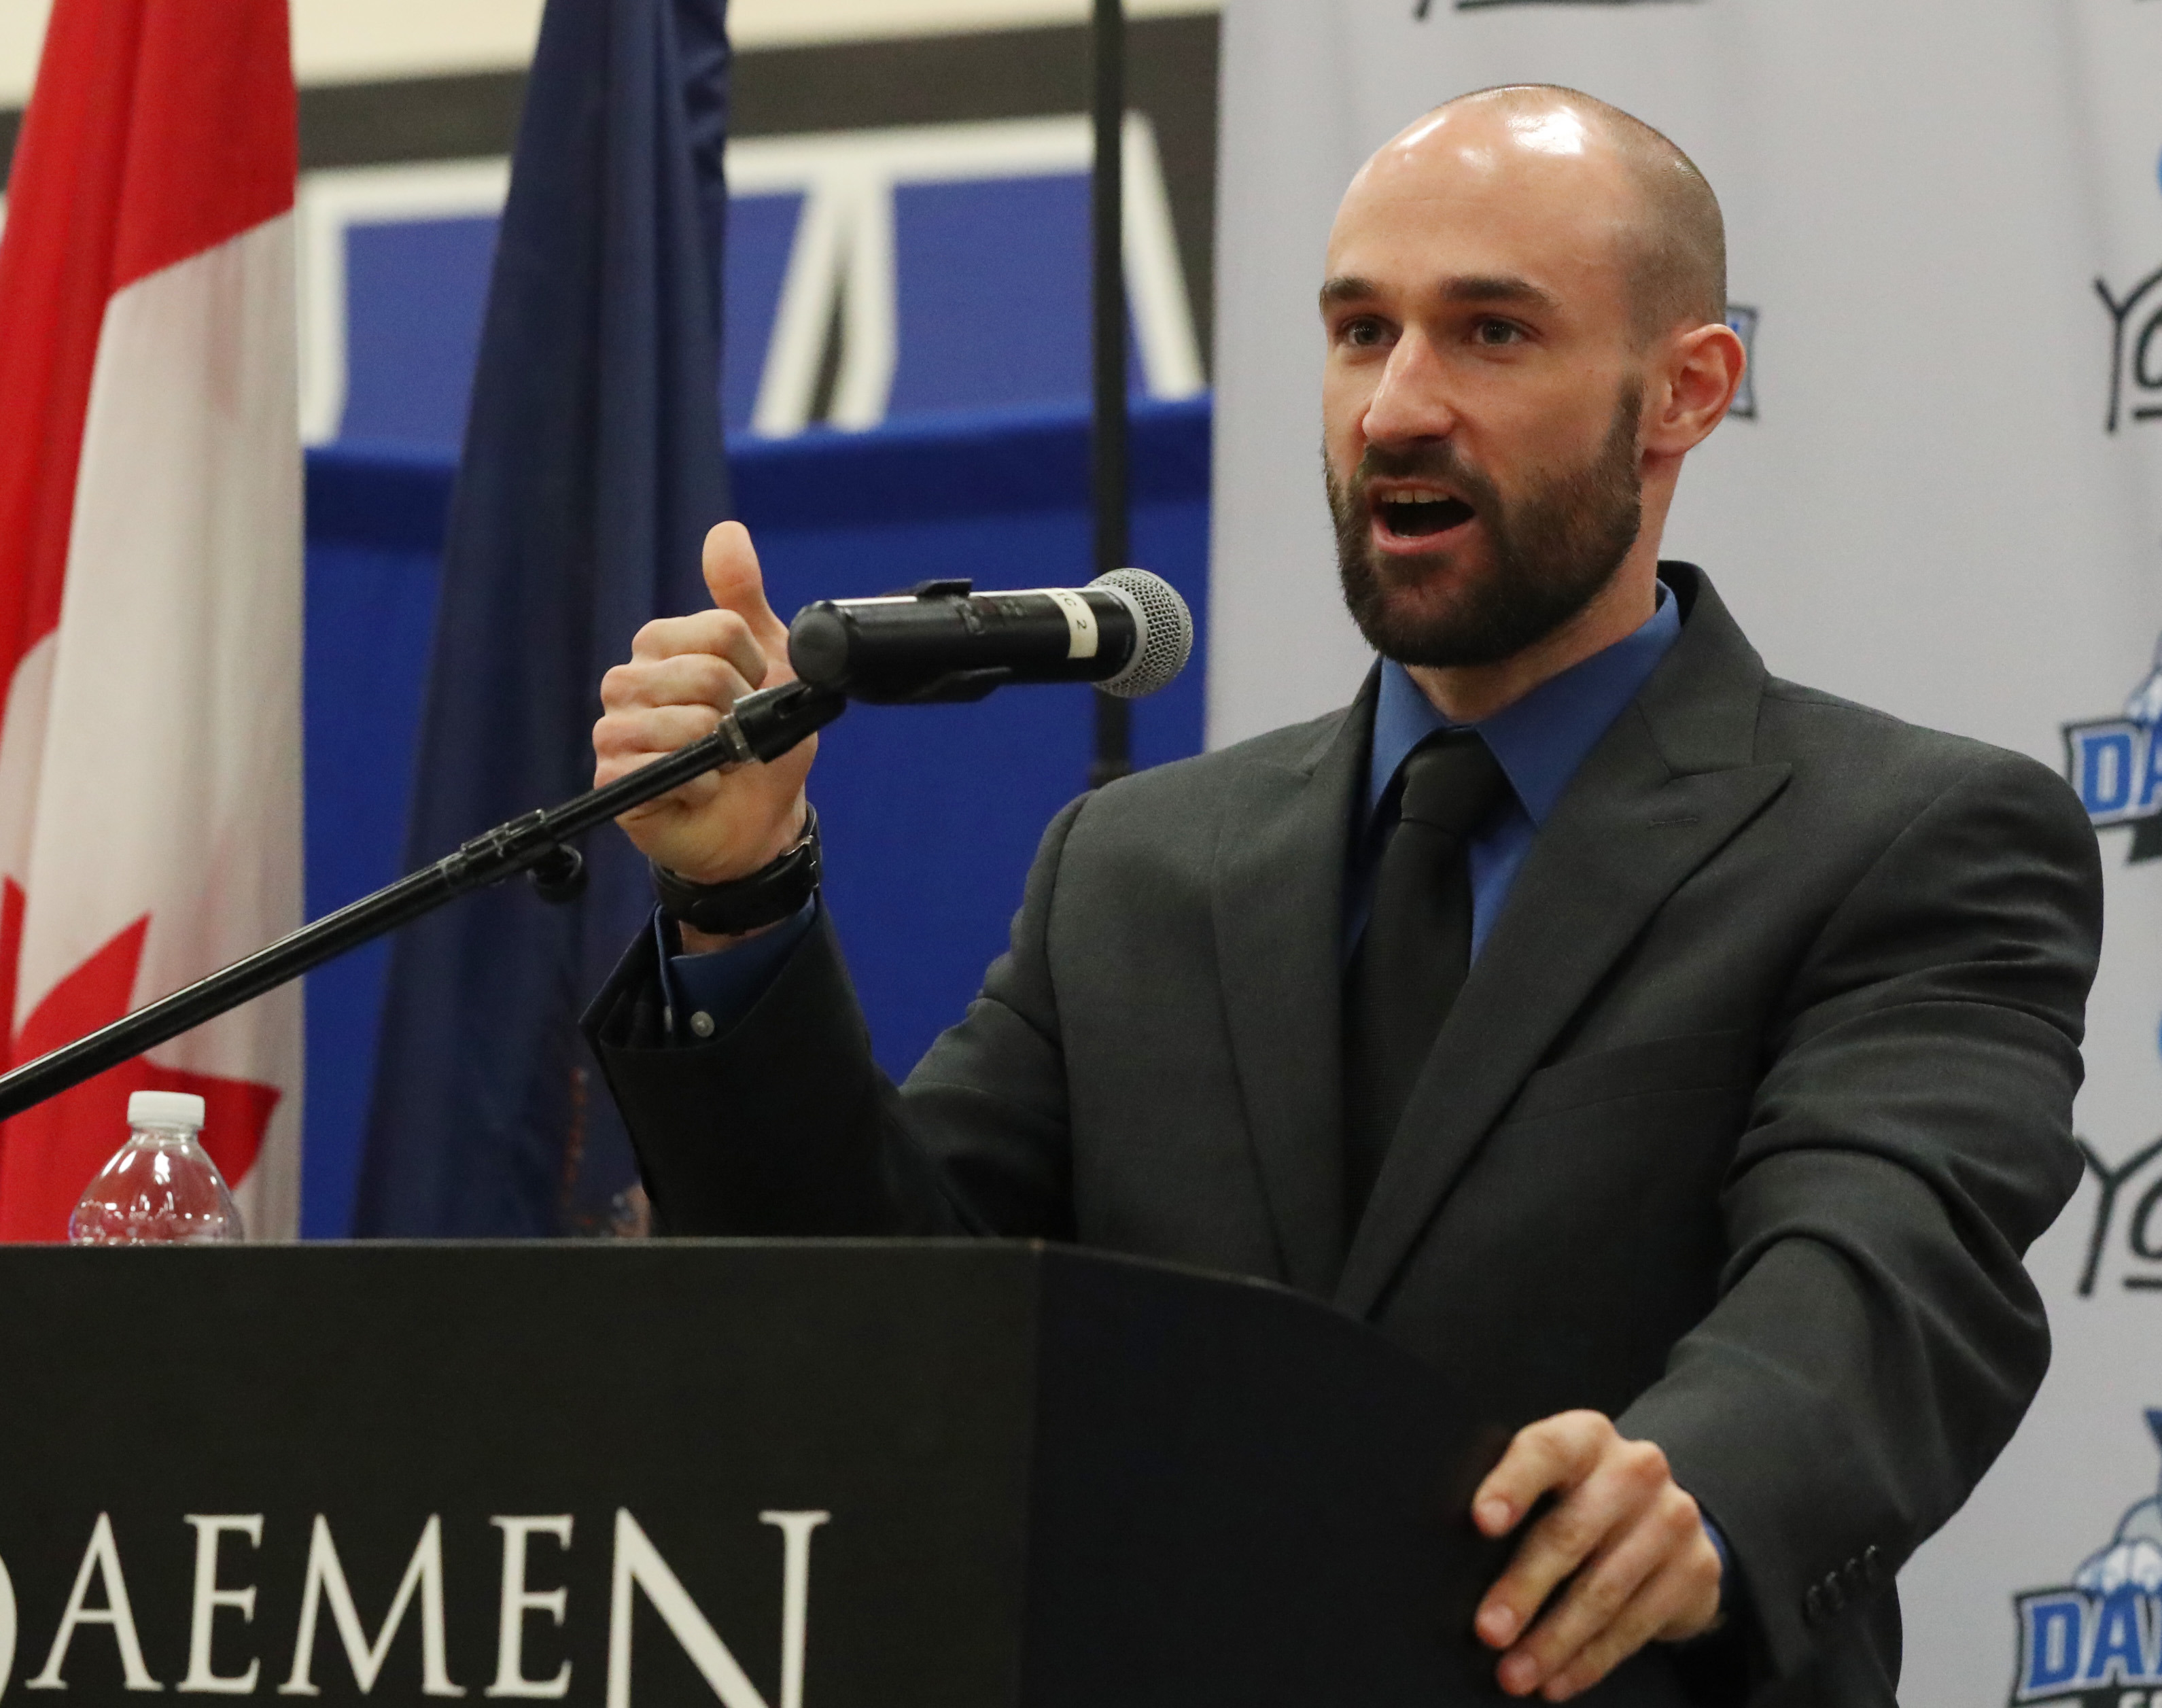 Daemen introduced Don Gleason as their new mens volleyball coach Friday. (James P. McCoy/Buffalo News)